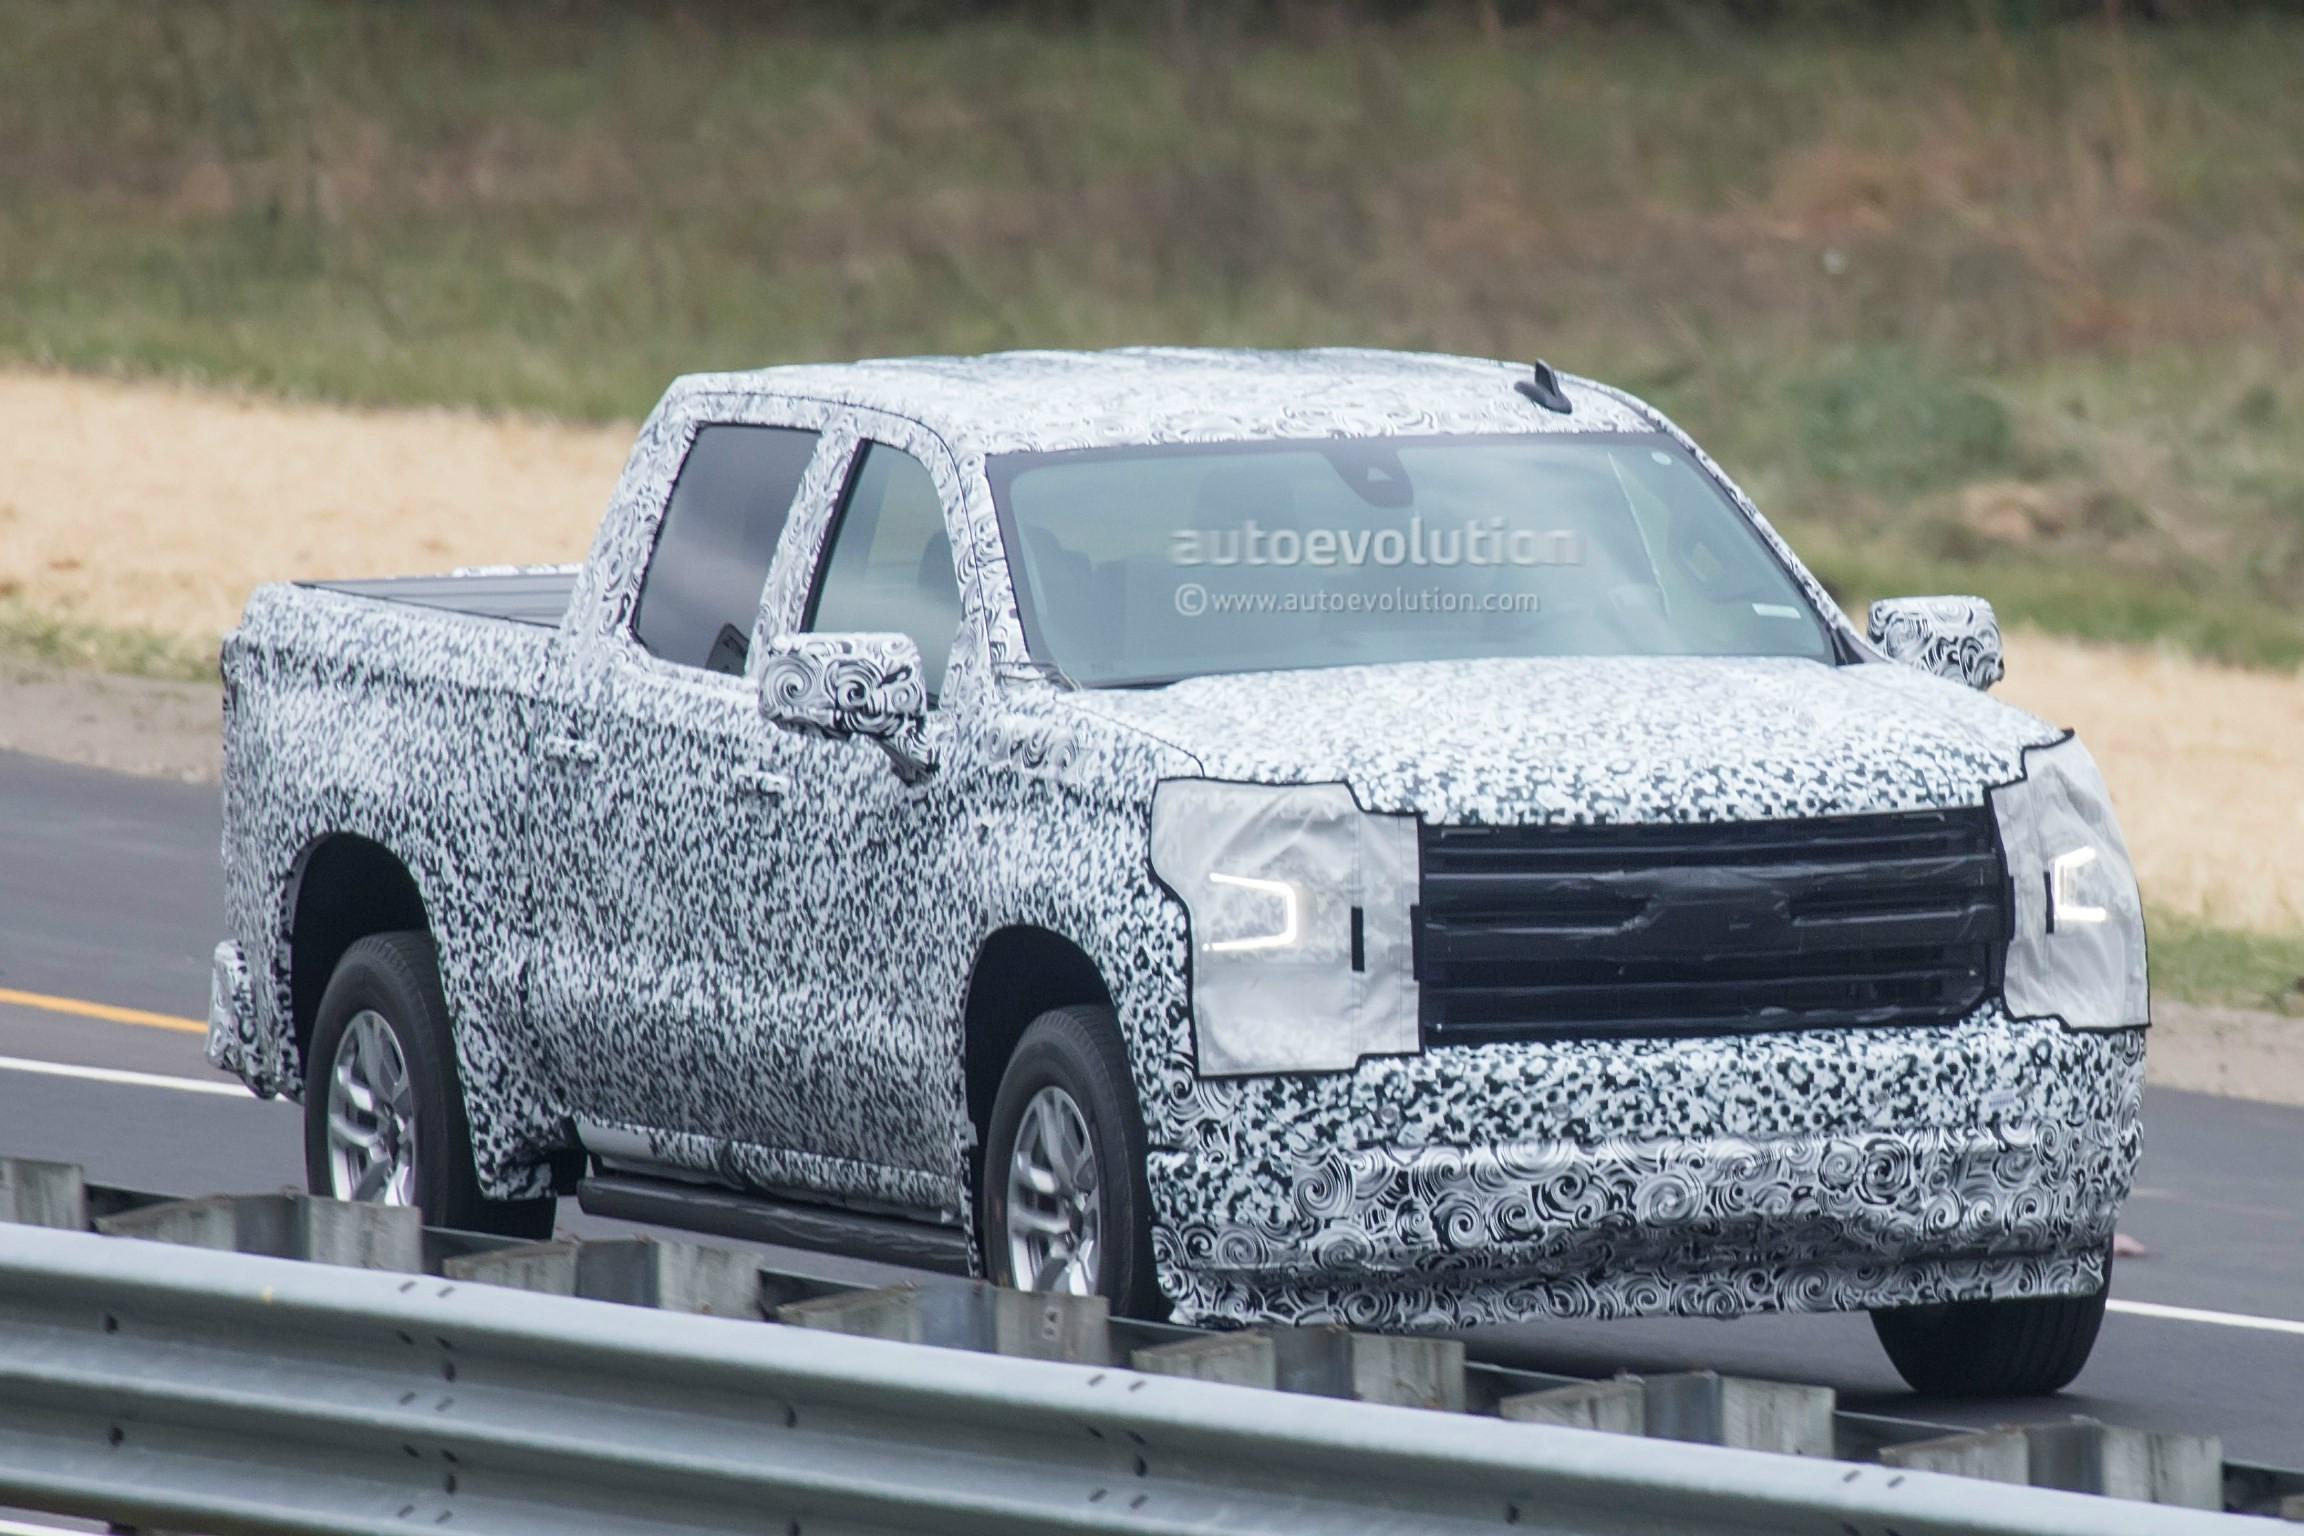 Spyshots: 2019 Chevrolet Silverado Shows More Design ...